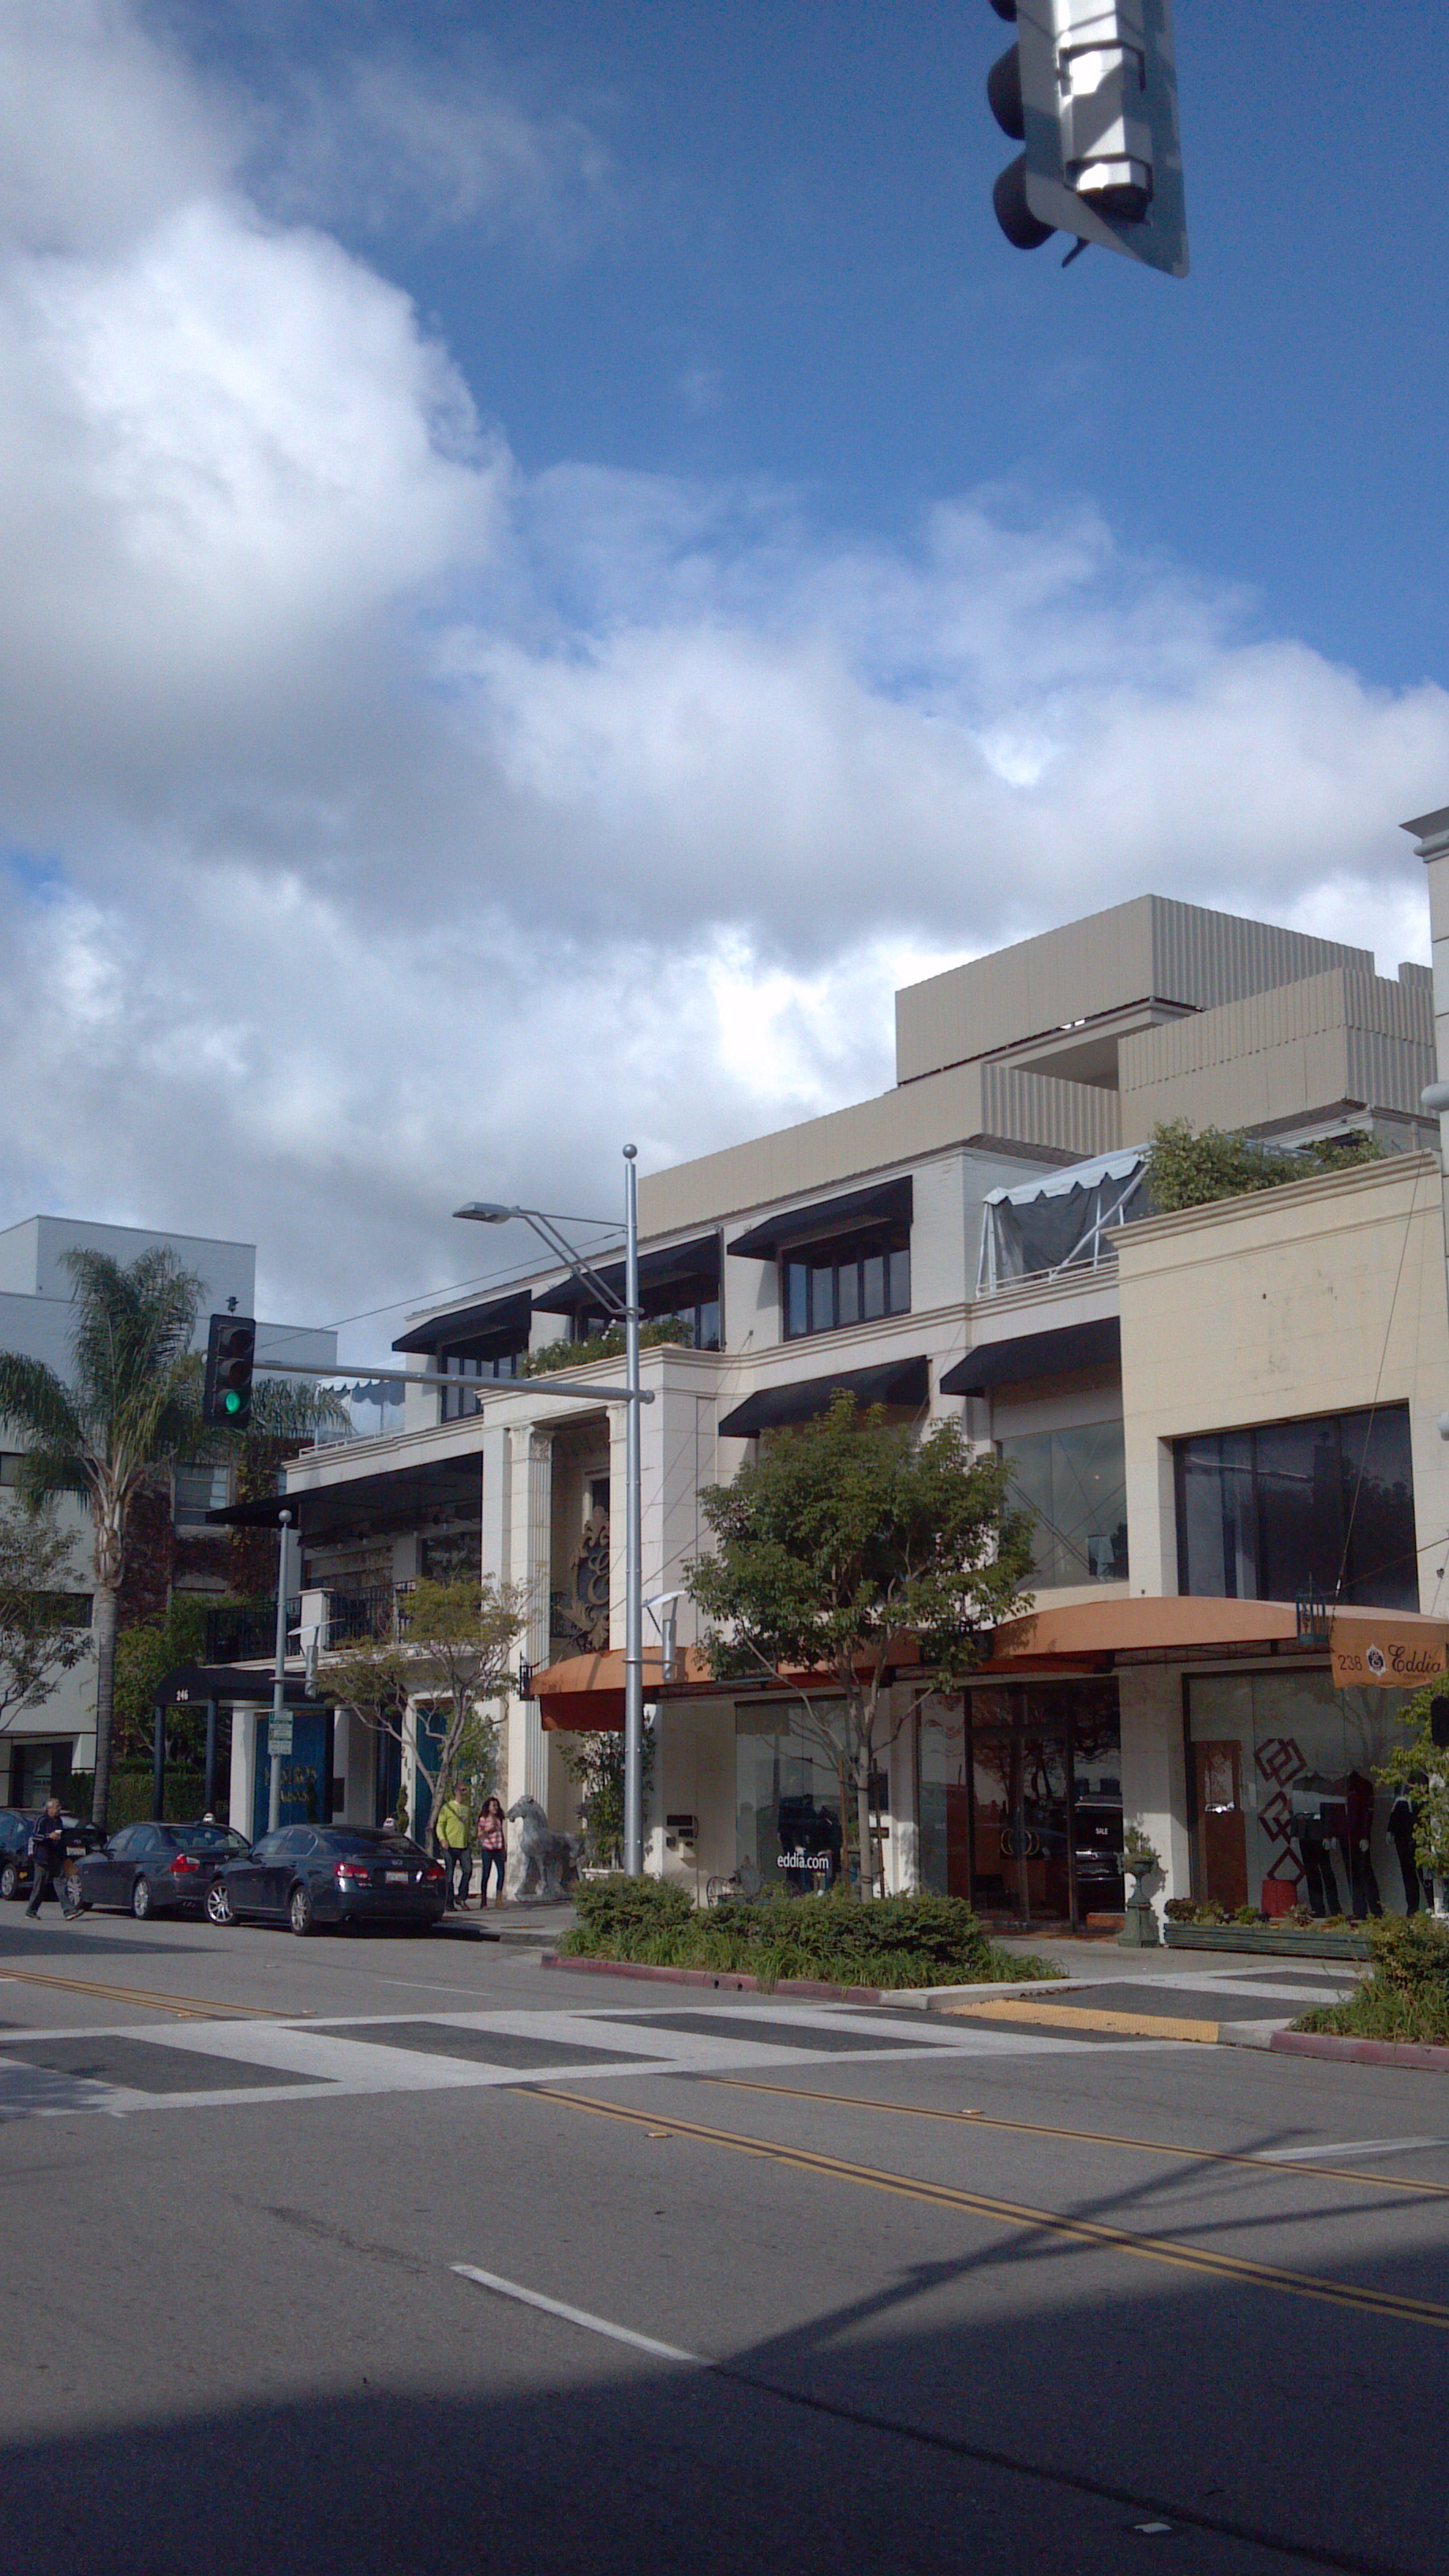 Best Restaurants In Beverly Hills To See Celebrities